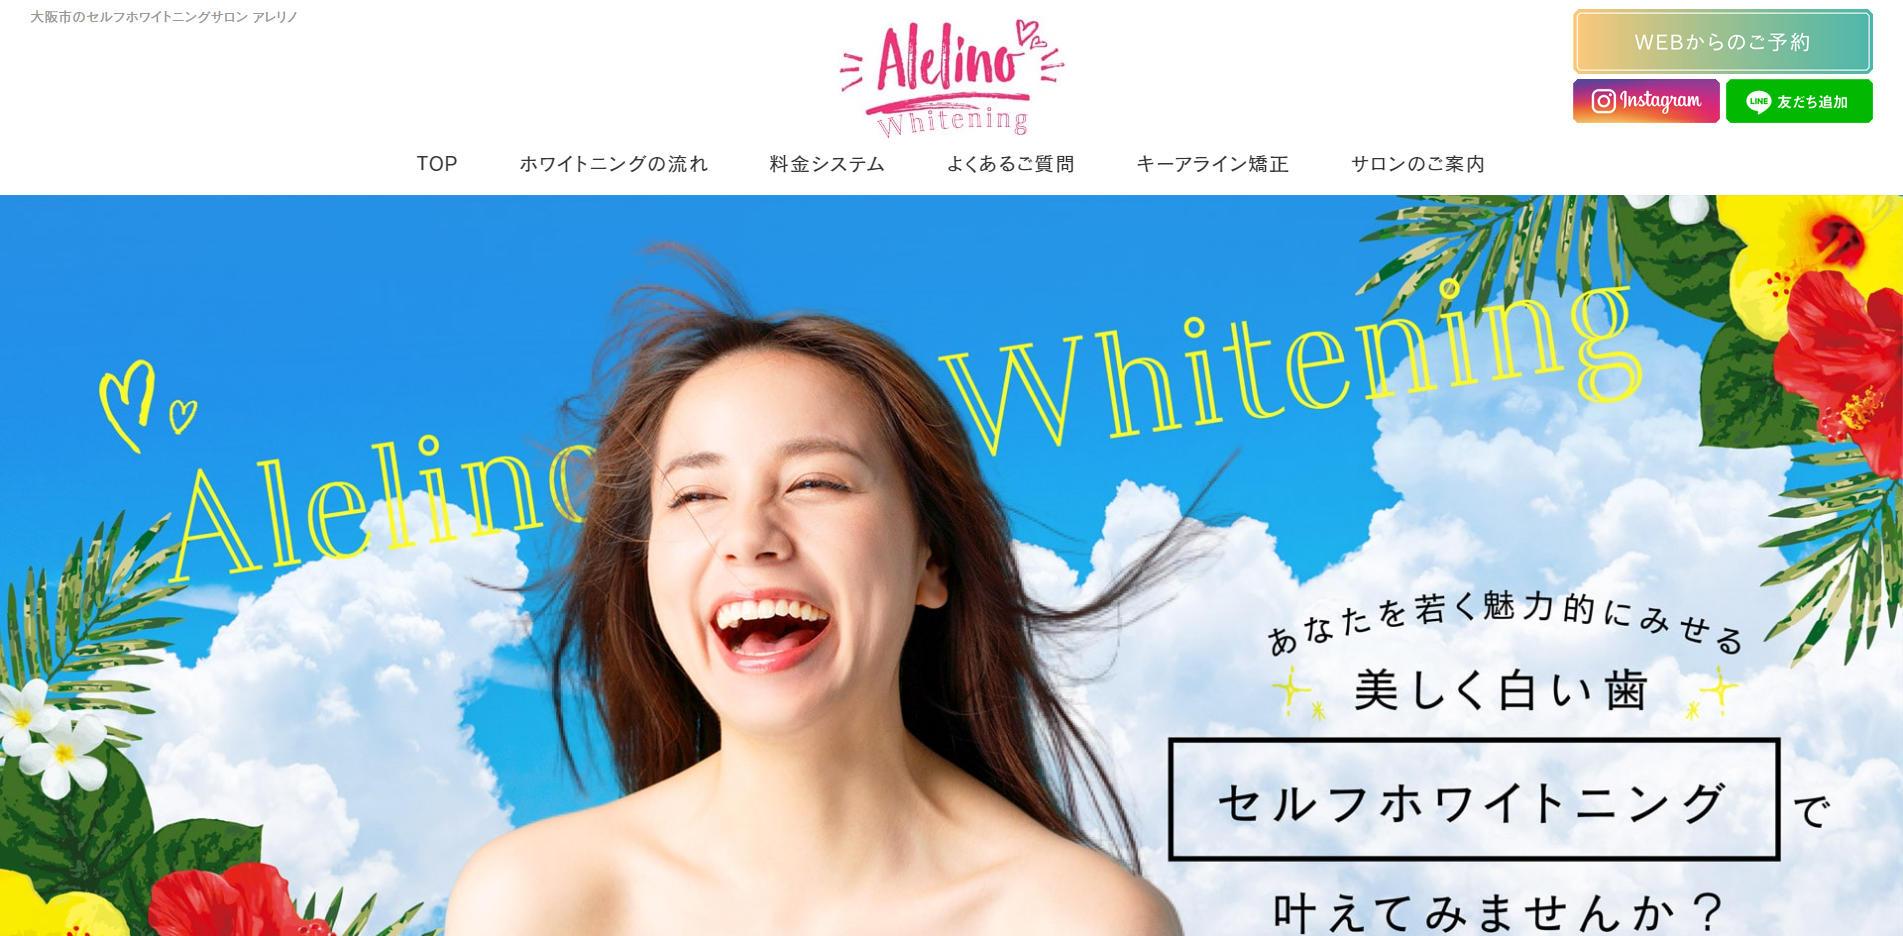 Alelino_Whiteningホームページ